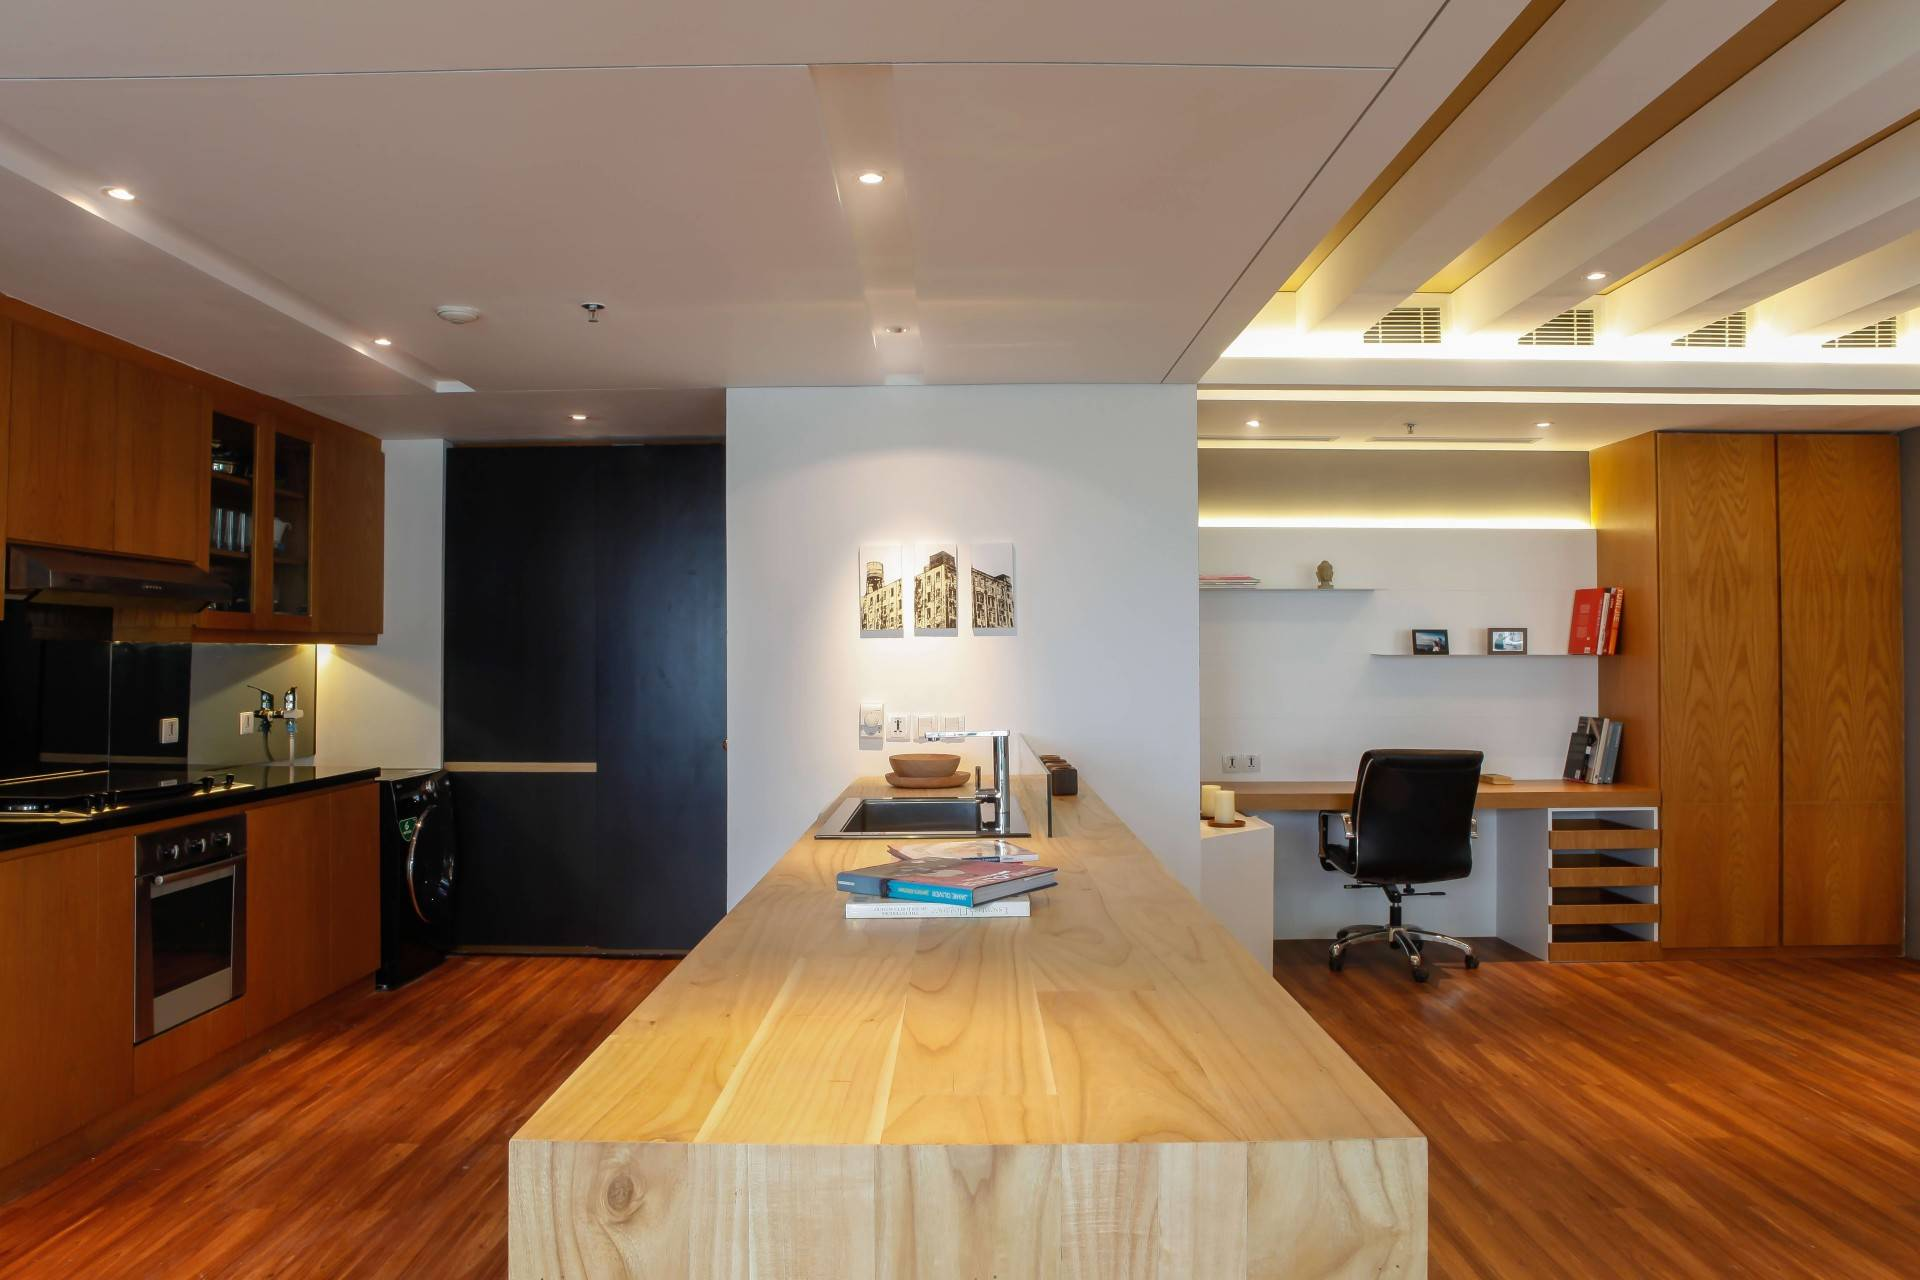 Design Intervention Pavilion Apartment At Kh Mas Mansyur Jakarta Jakarta Kitchen Minimalis,modern,industrial,glass  2585